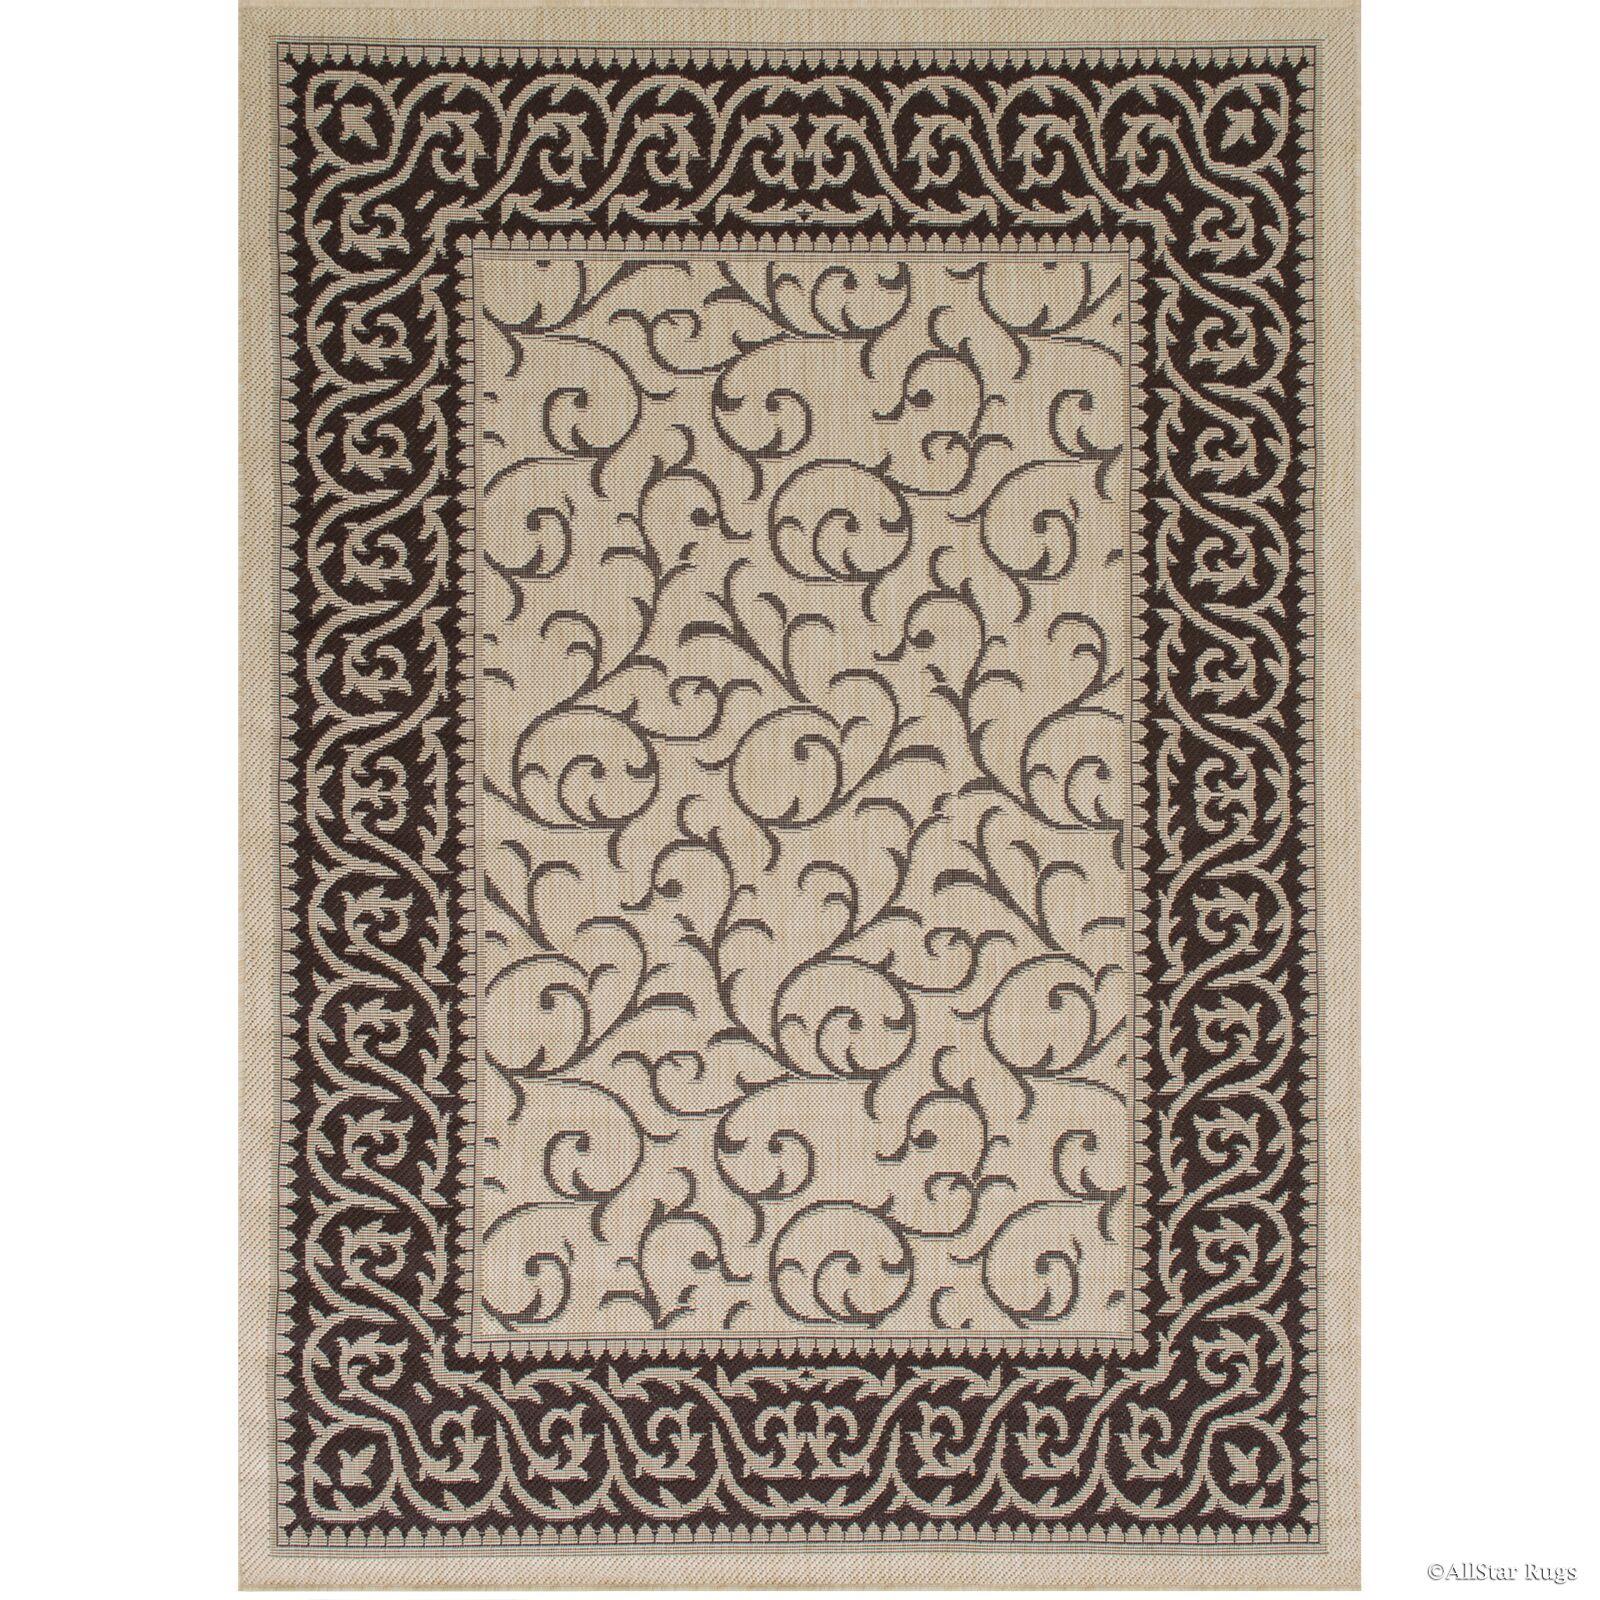 Morales All-Weather Floral Sage Beige Indoor/Outdoor Area Rug Rug Size: 5' x 7'